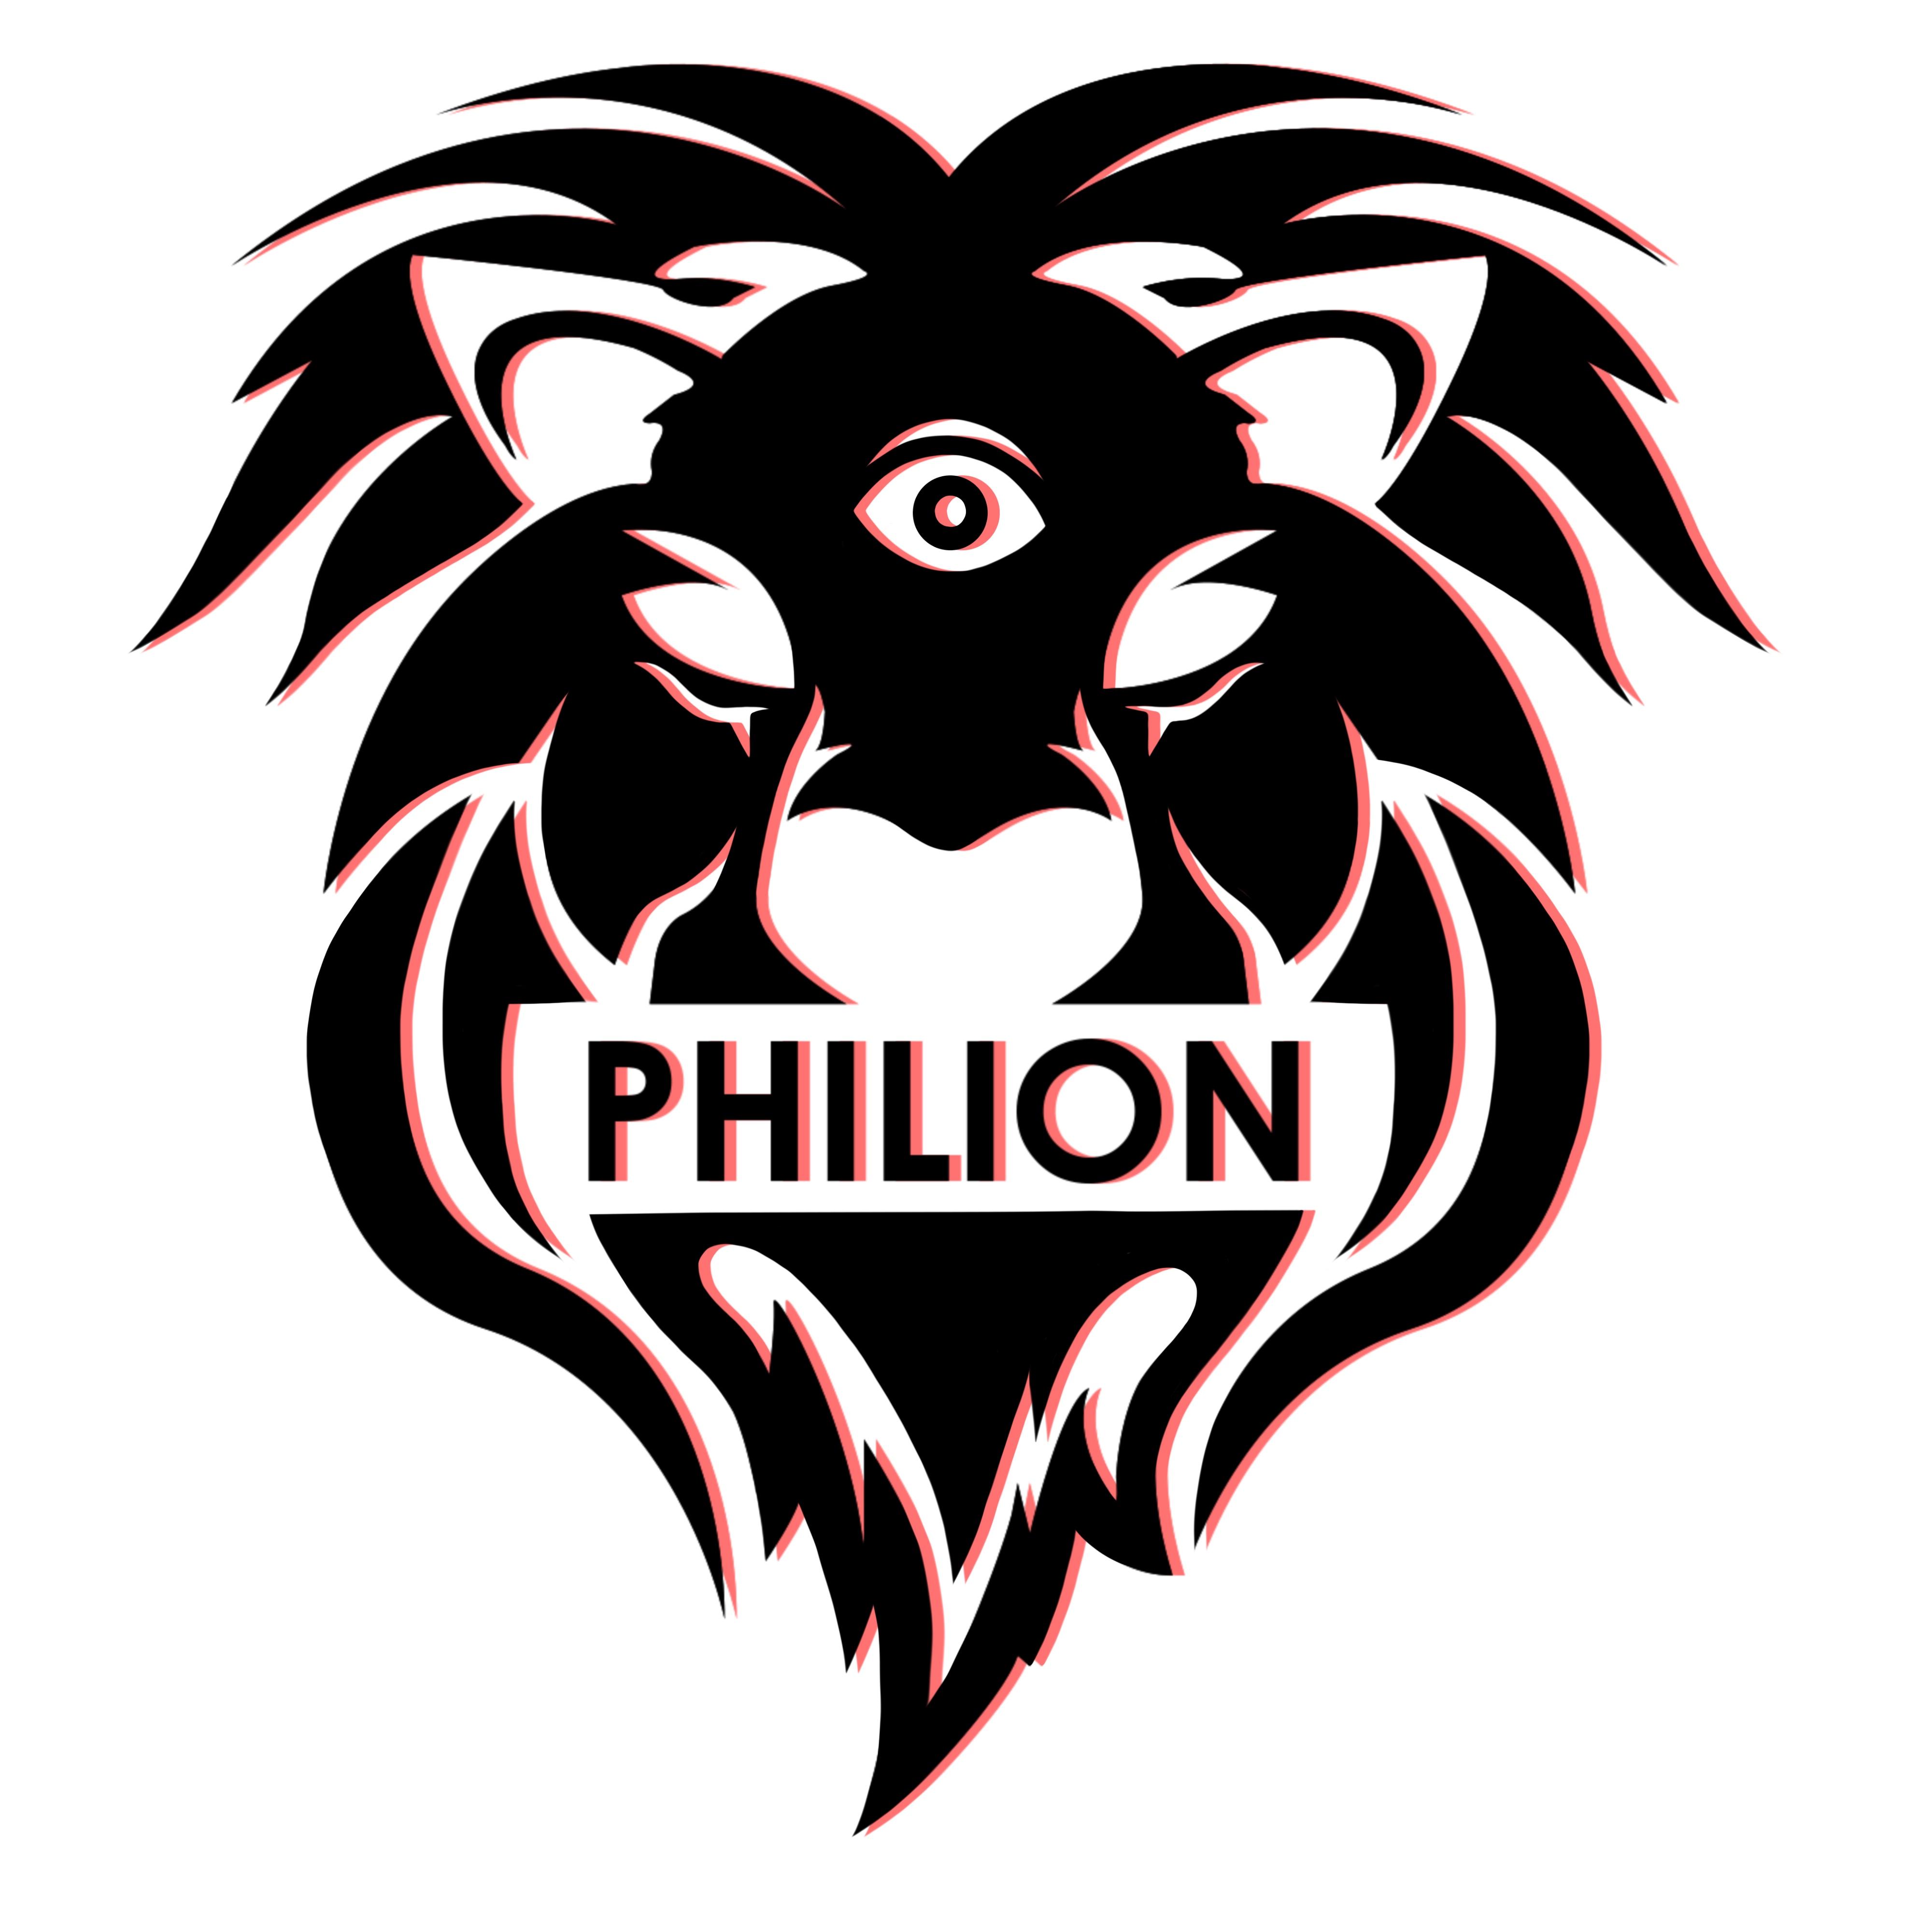 PHILION